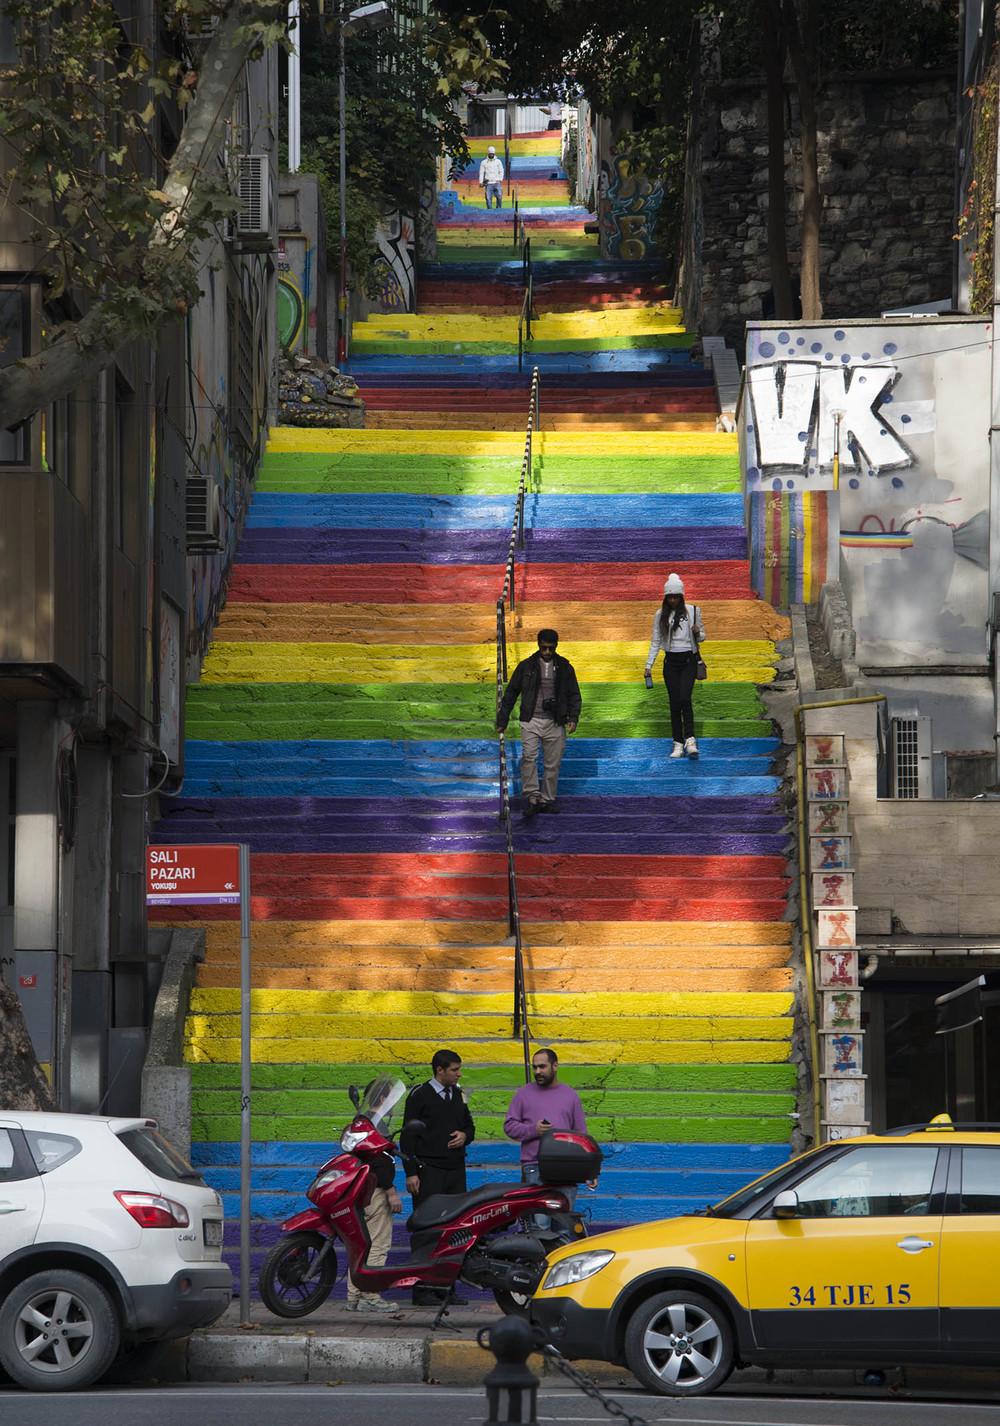 Fındıklı- Cihangir stairs, Istanbul